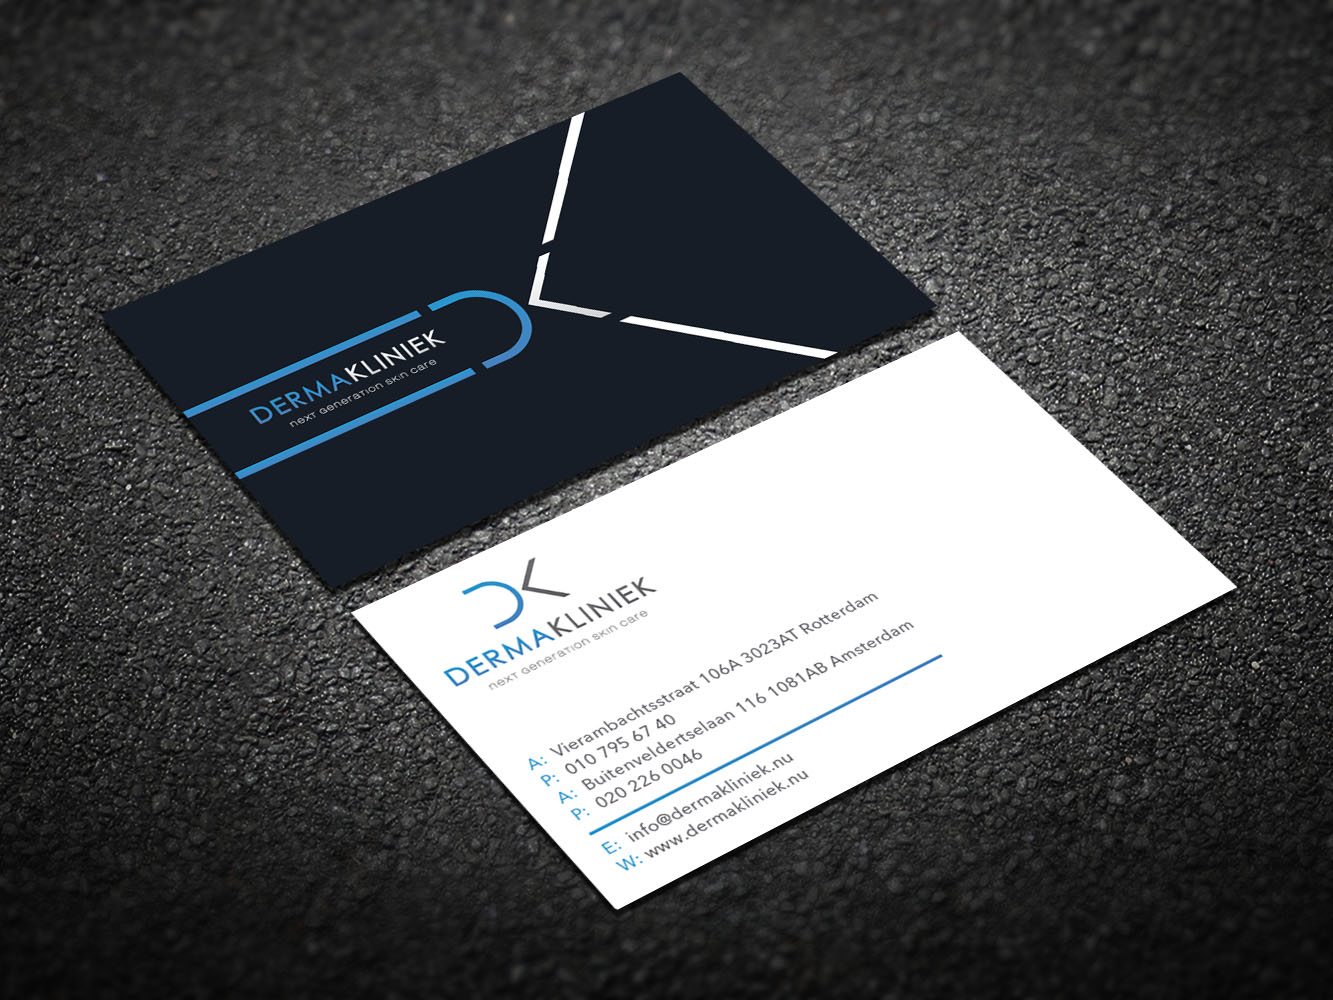 Elegant, Modern Business Card Design for Derma Kliniek by Design ...